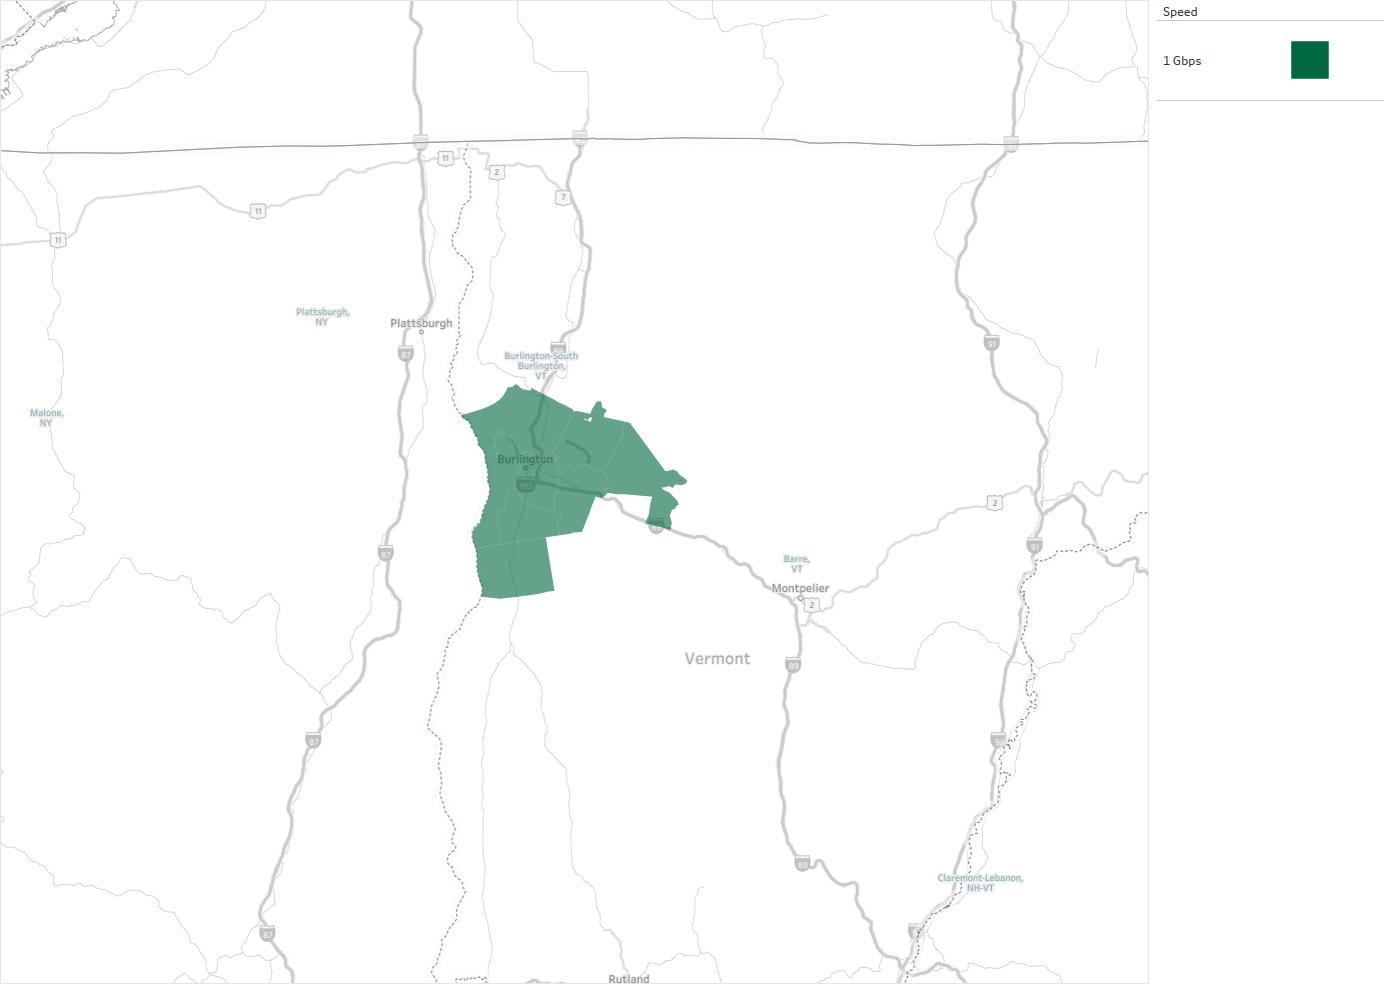 City of Burlington dba Burlington Telecom Availability Areas